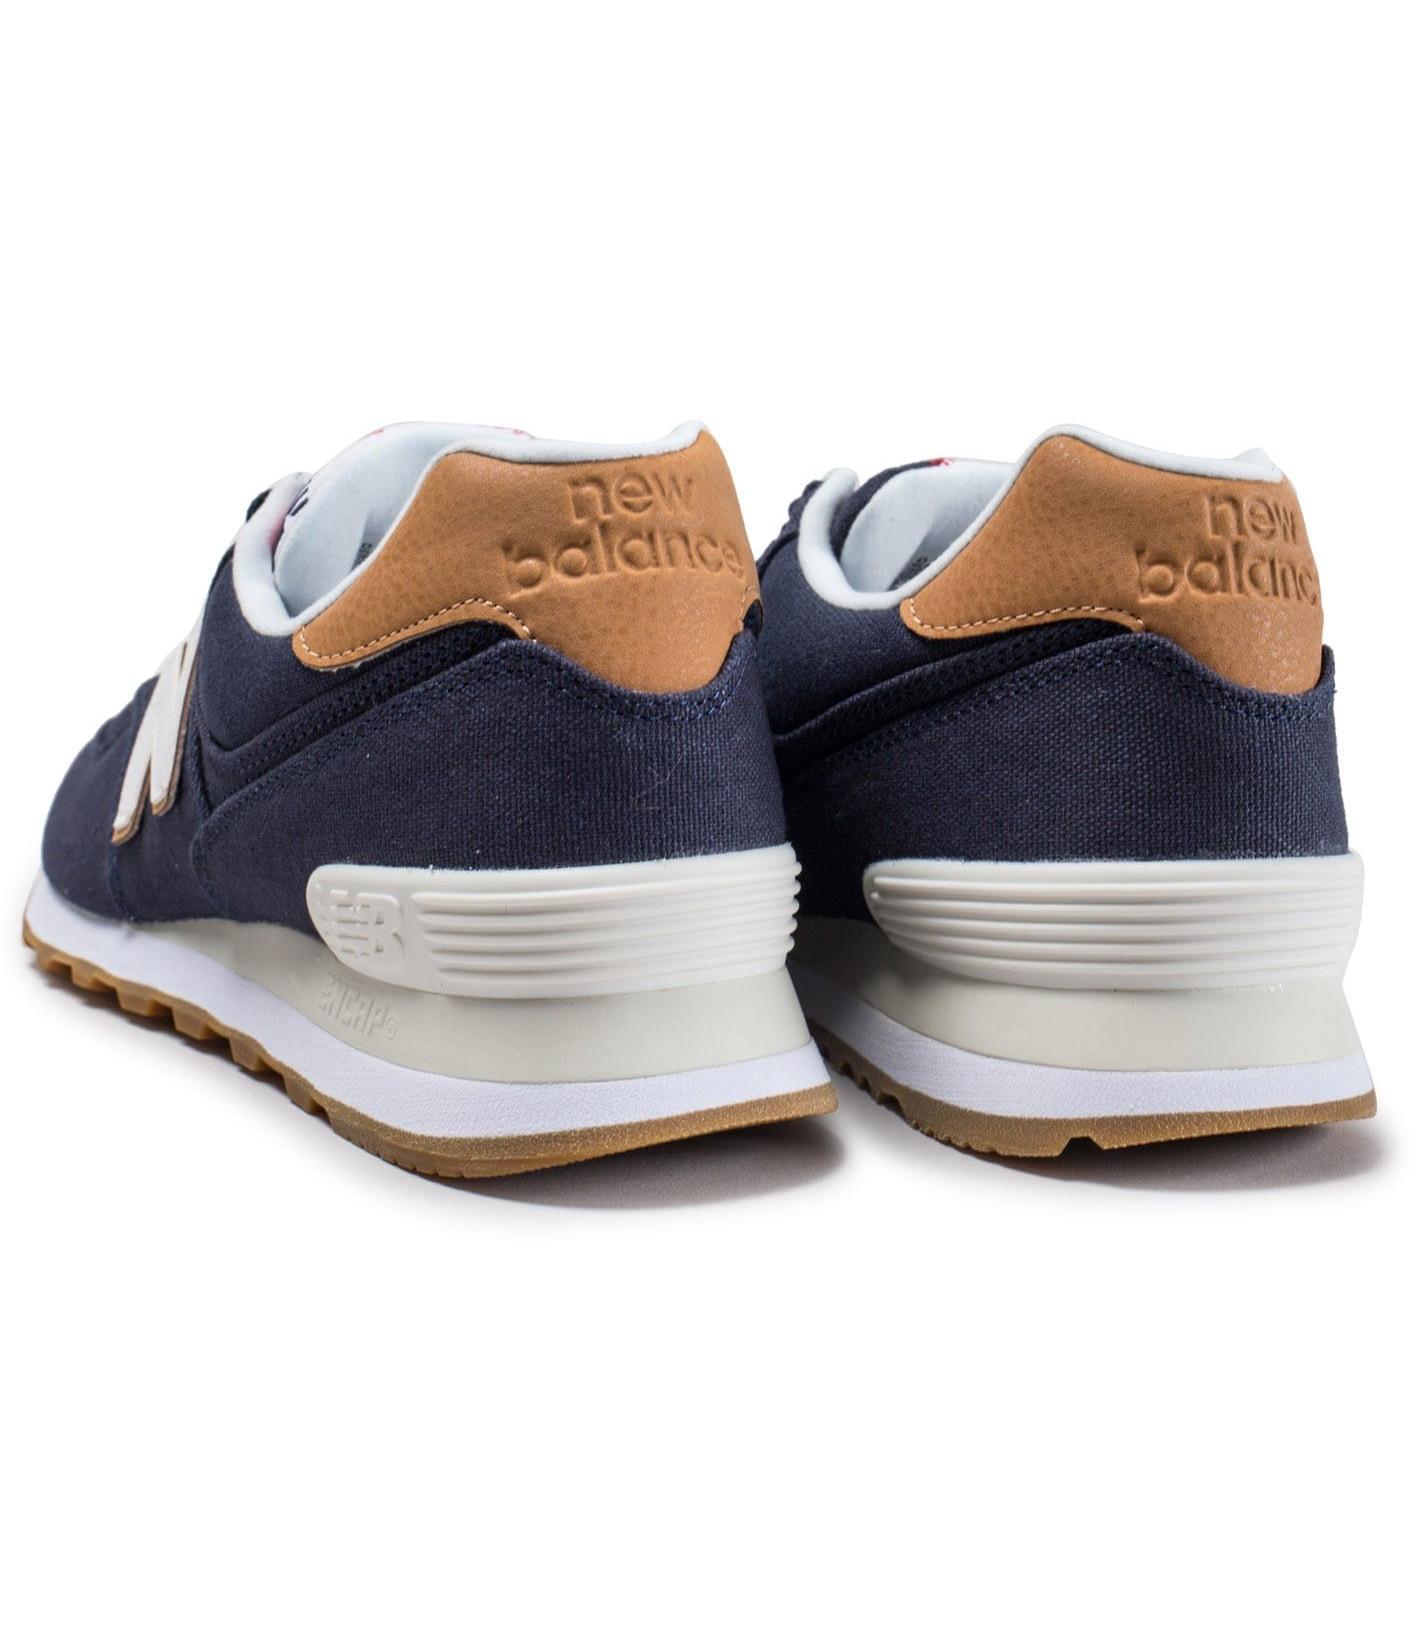 best loved a9cdd 7ed4a 2 sur 9 New Balance 574 Canvas Scarpe Sneakers Ginnastica Tennis Lifestyle  Blu